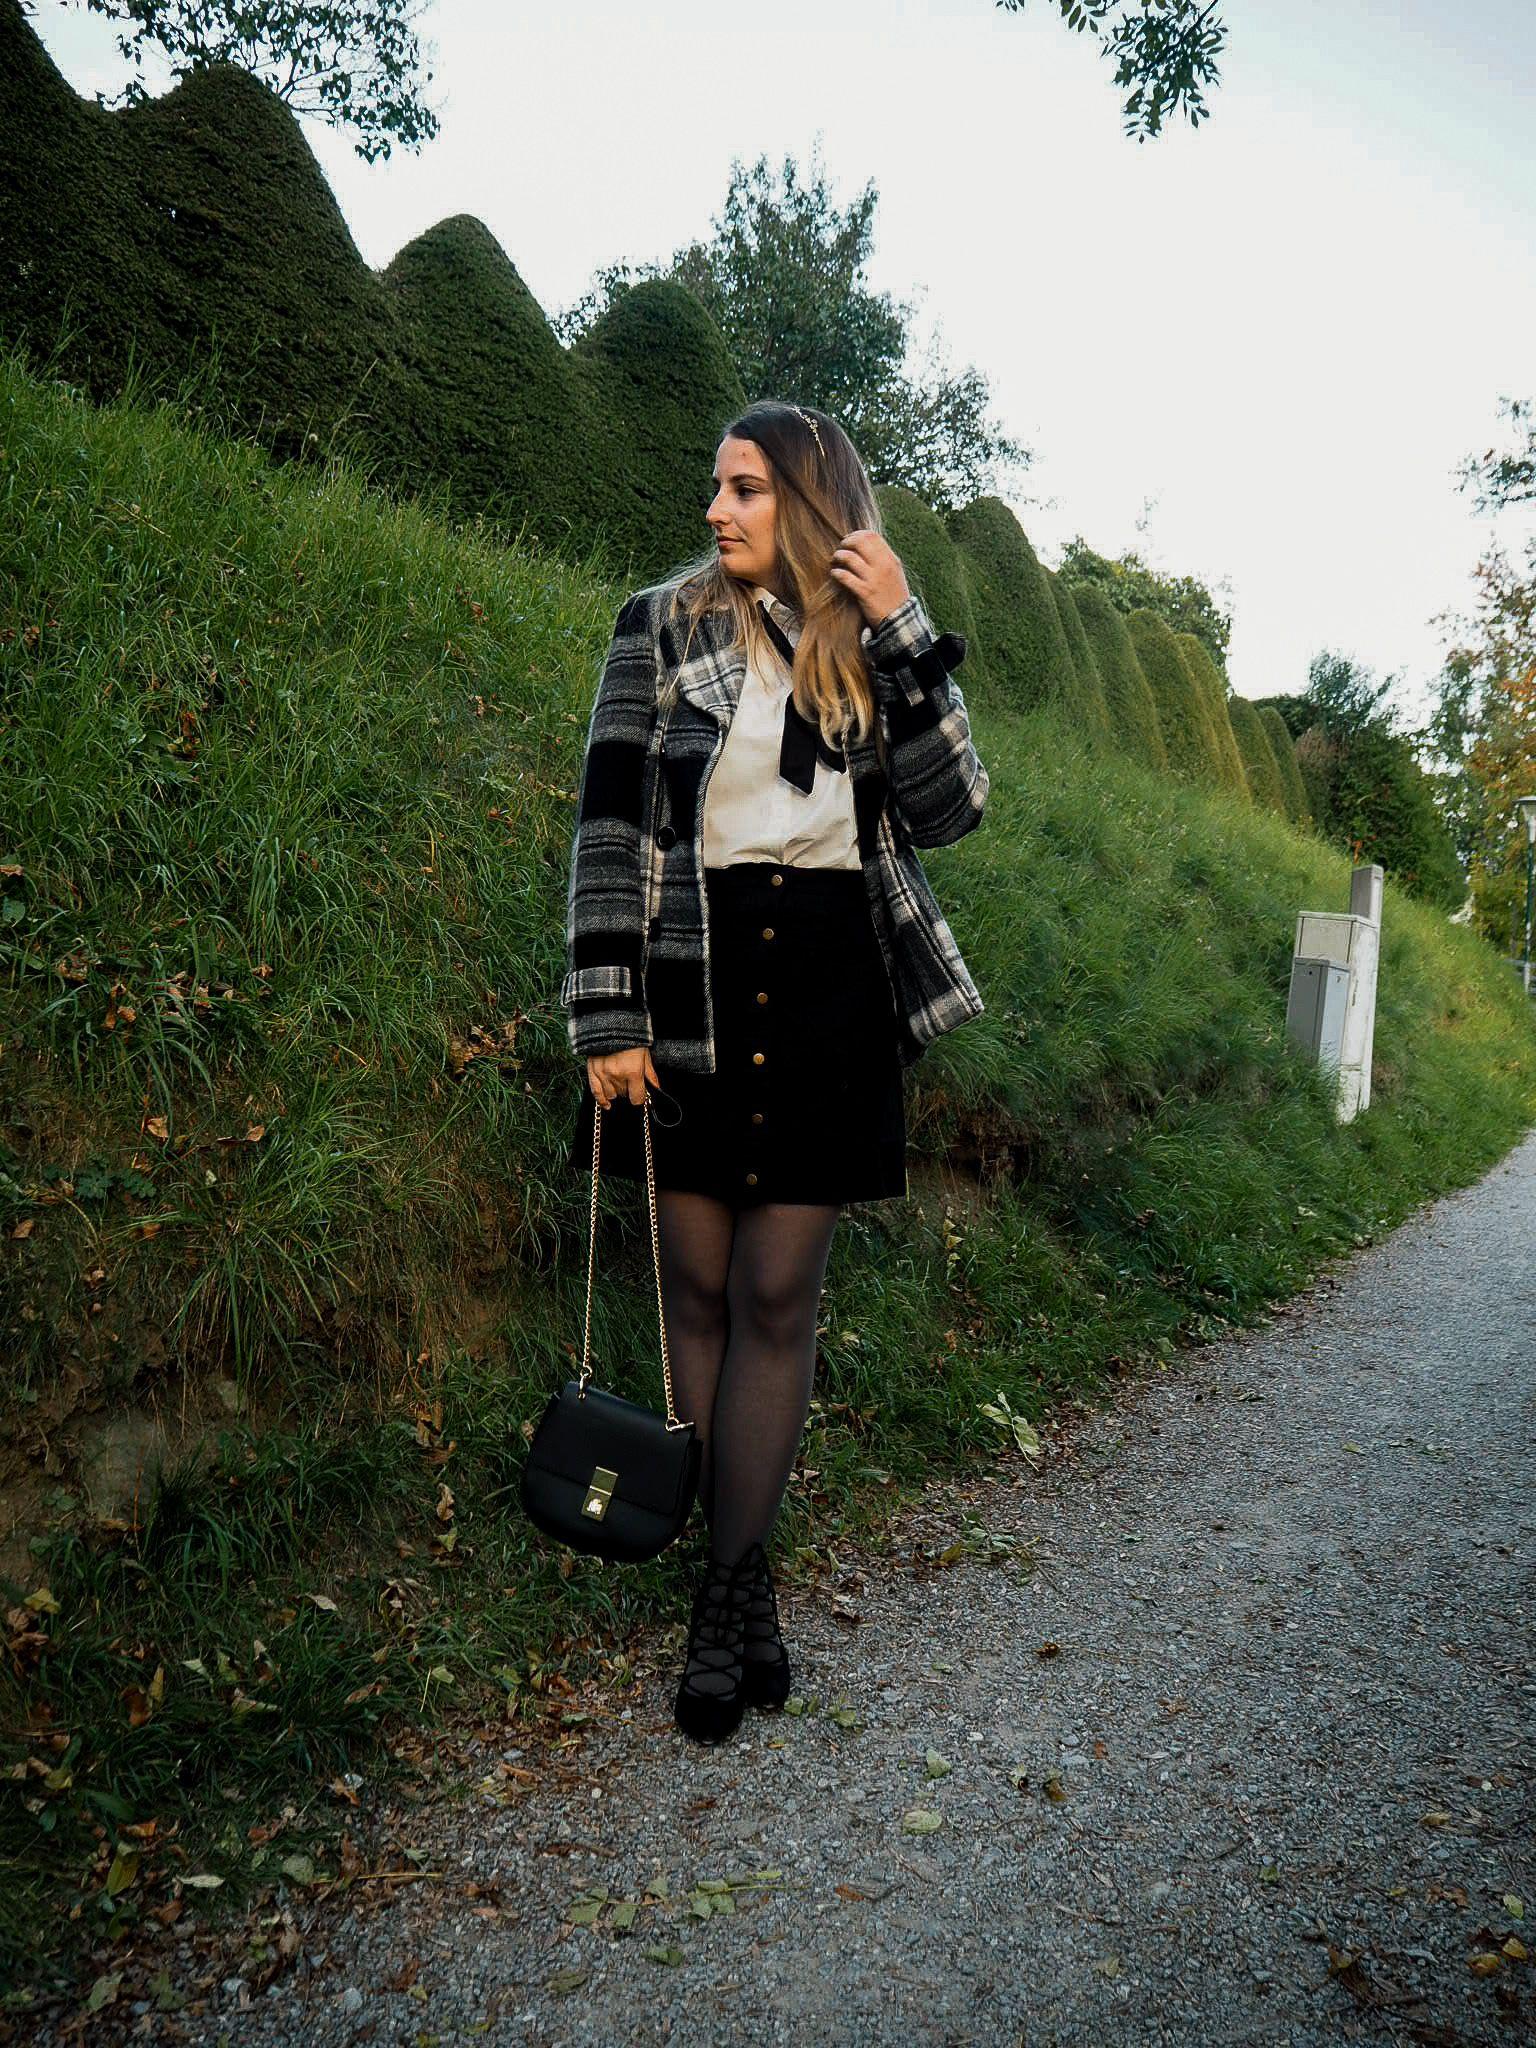 Blair Waldorf Inspired Outfit | Bluse mit schleife, Blair